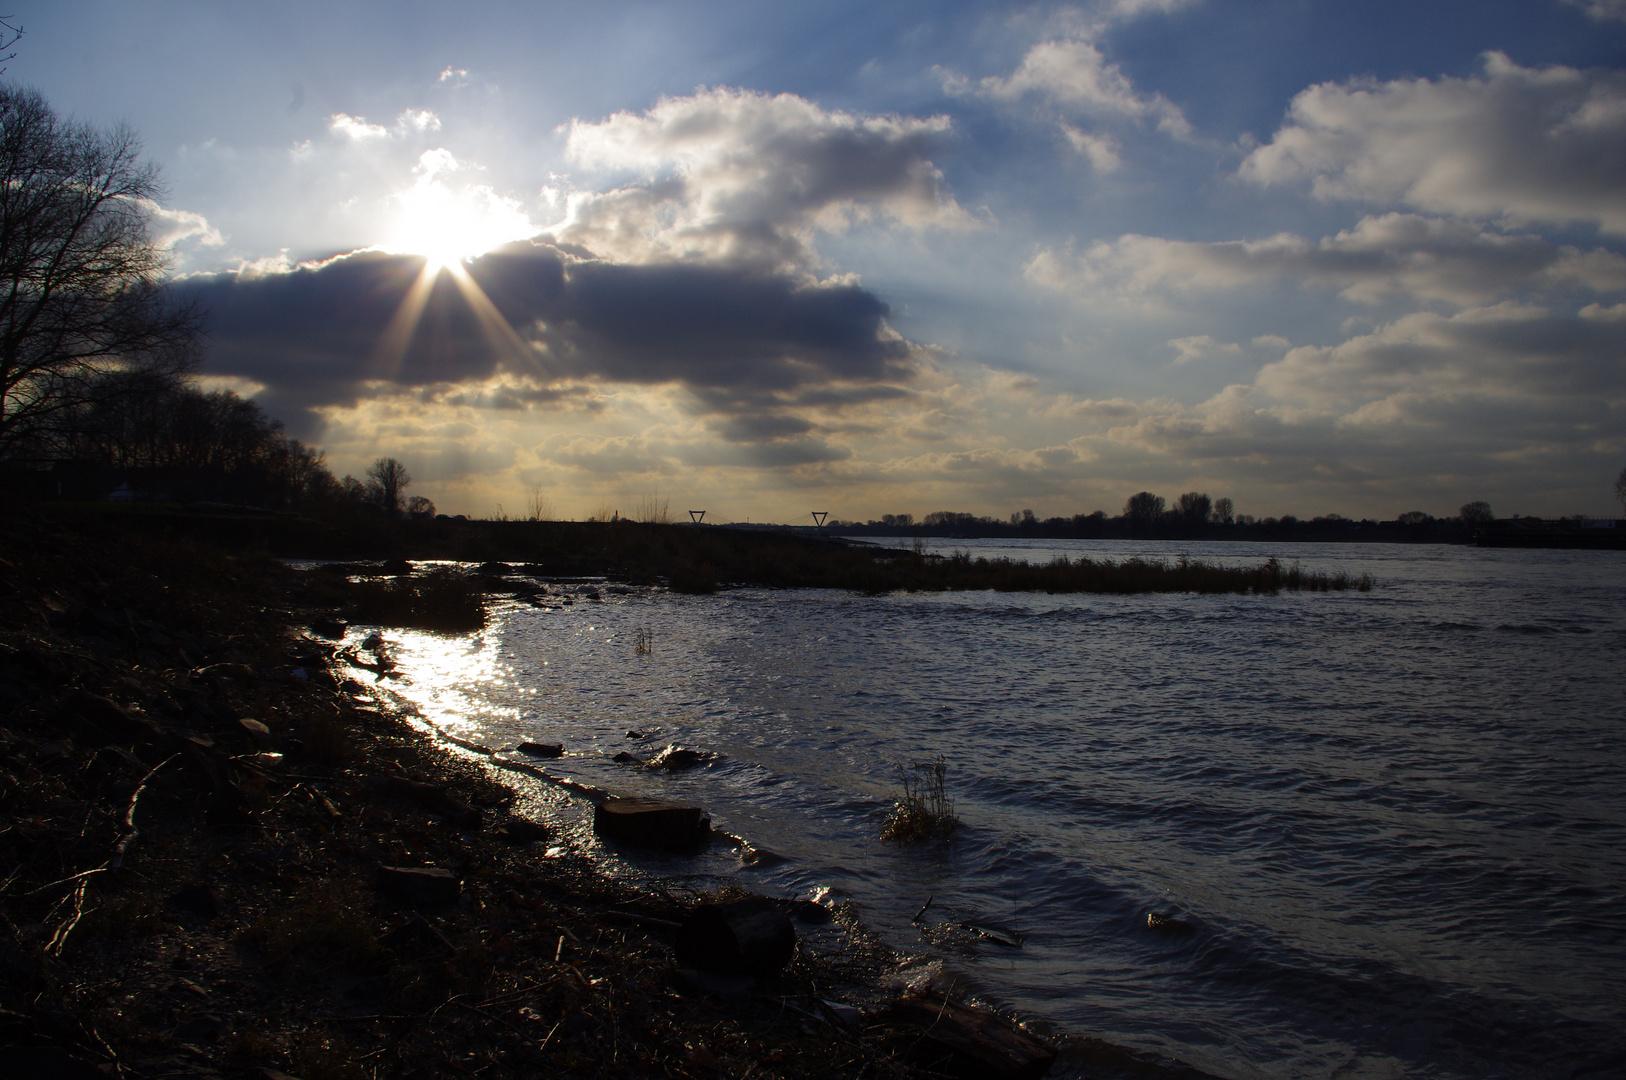 Rheinzufluss